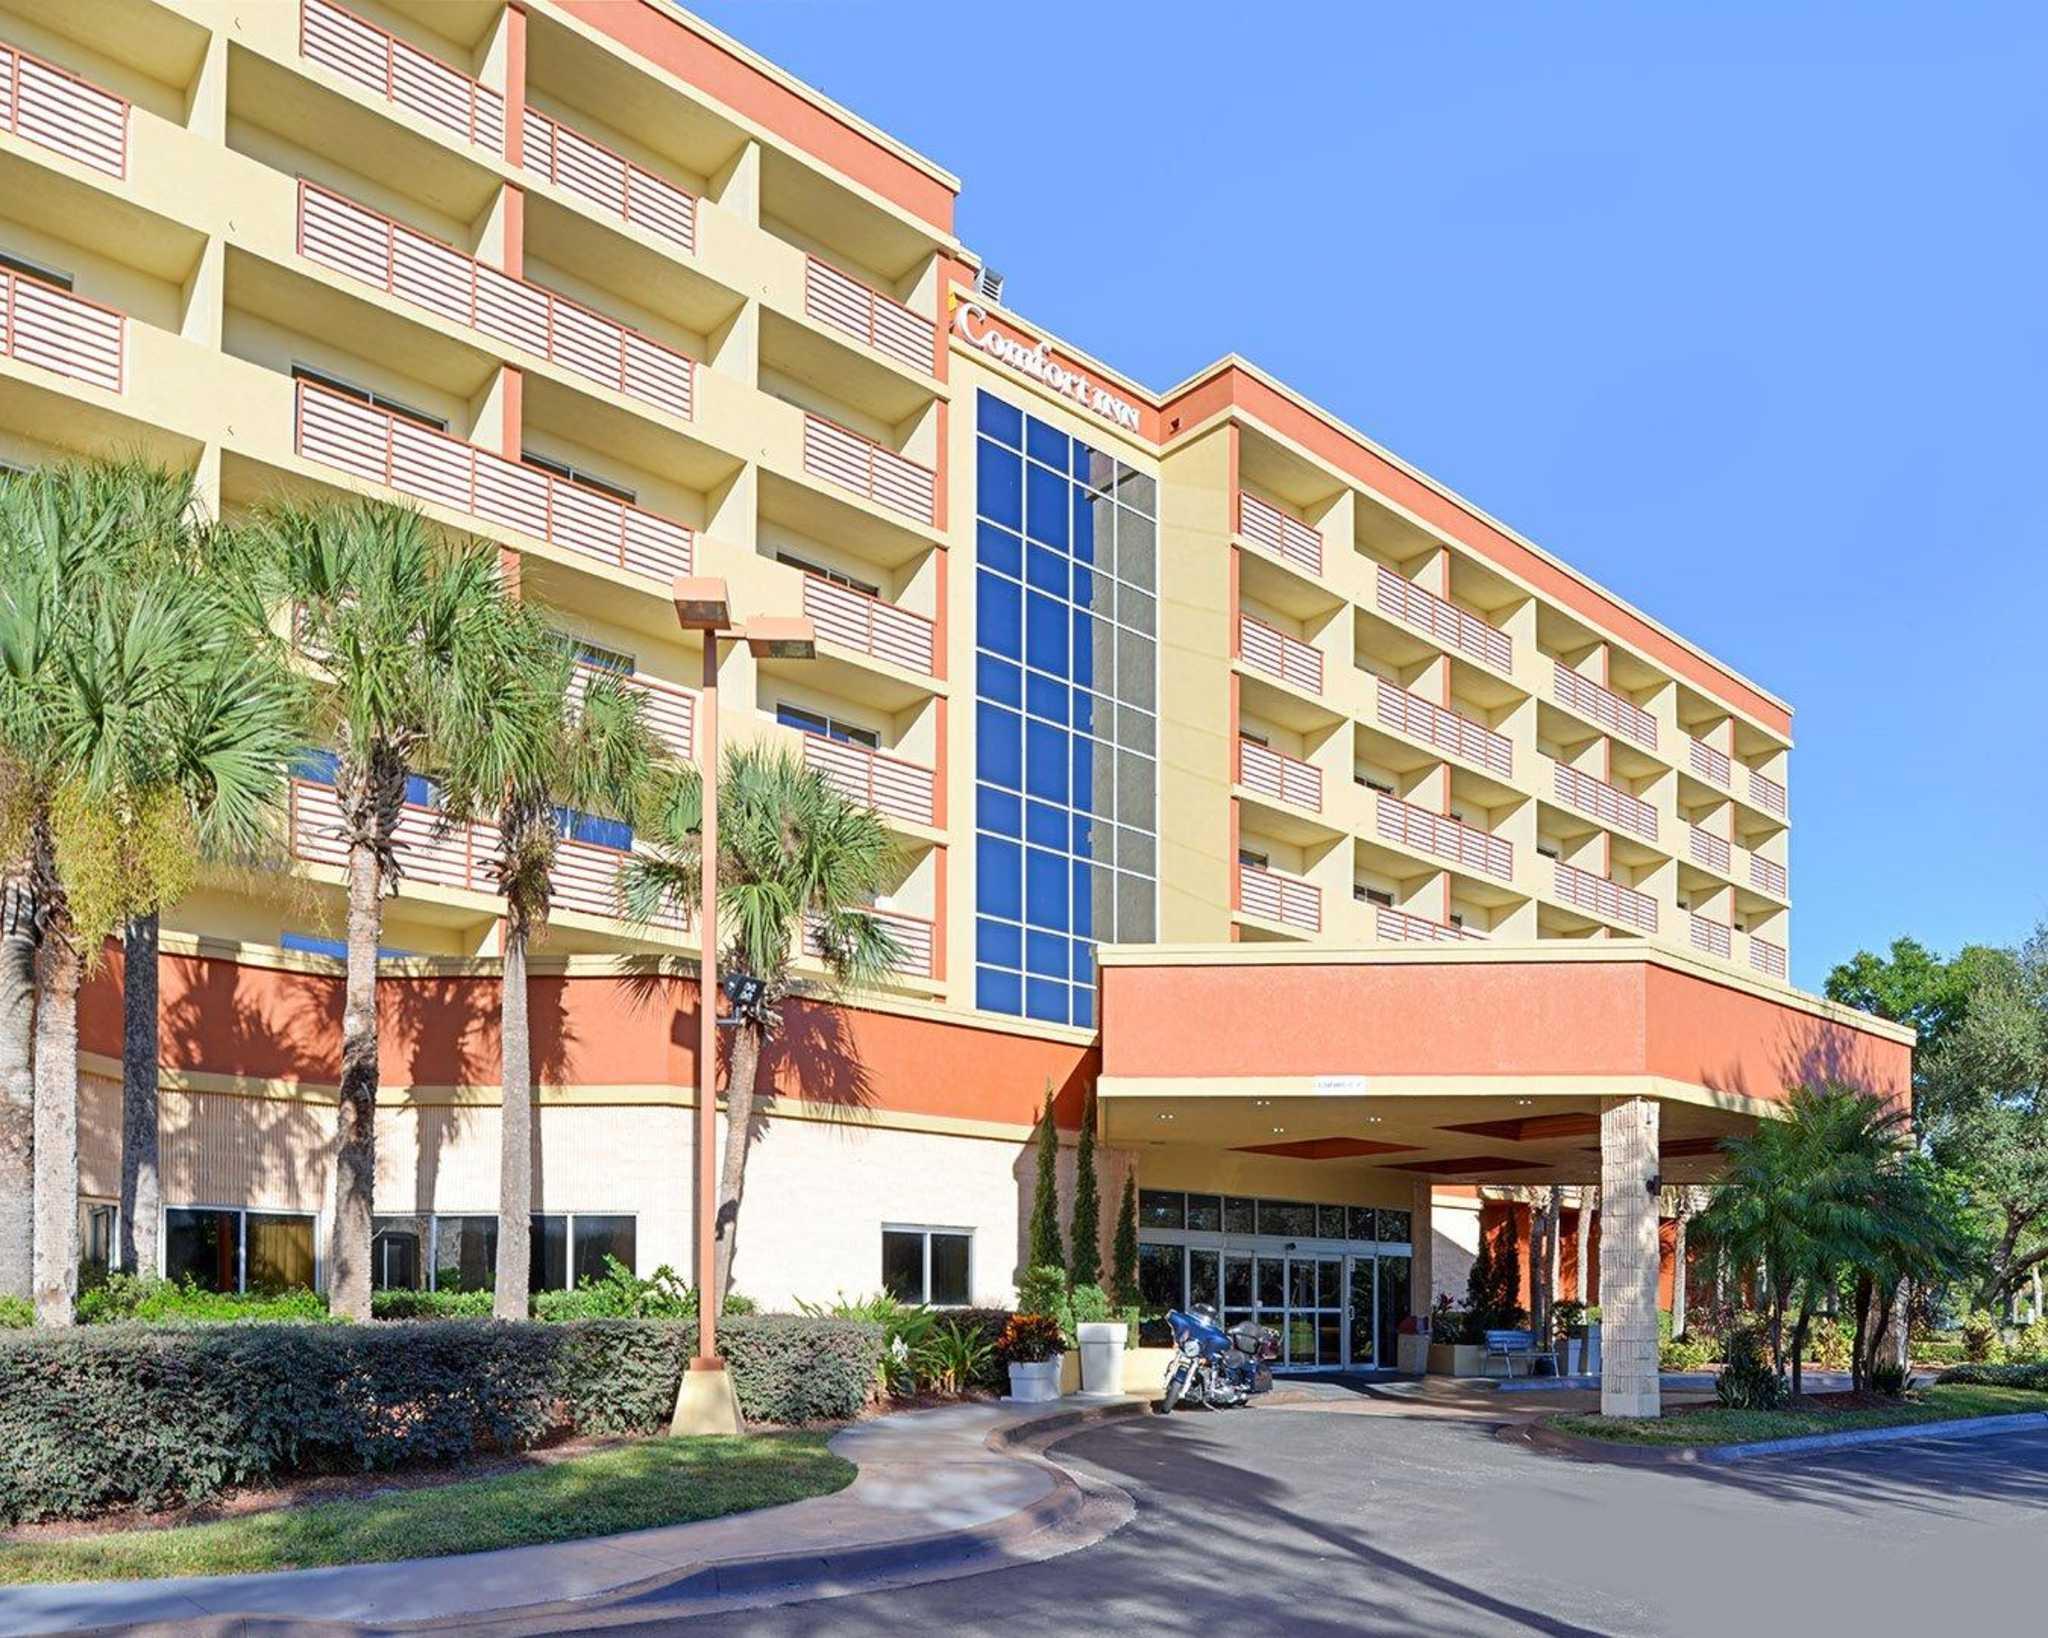 Jhm Hotels Orlando Florida